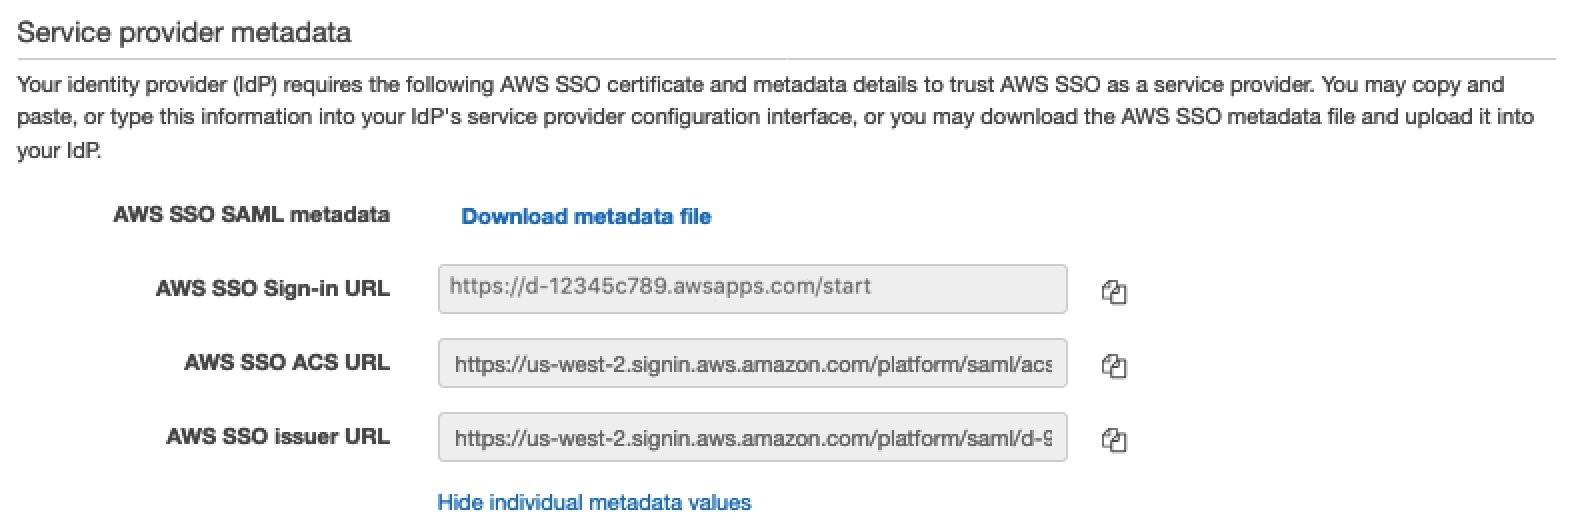 Service Provider metadata